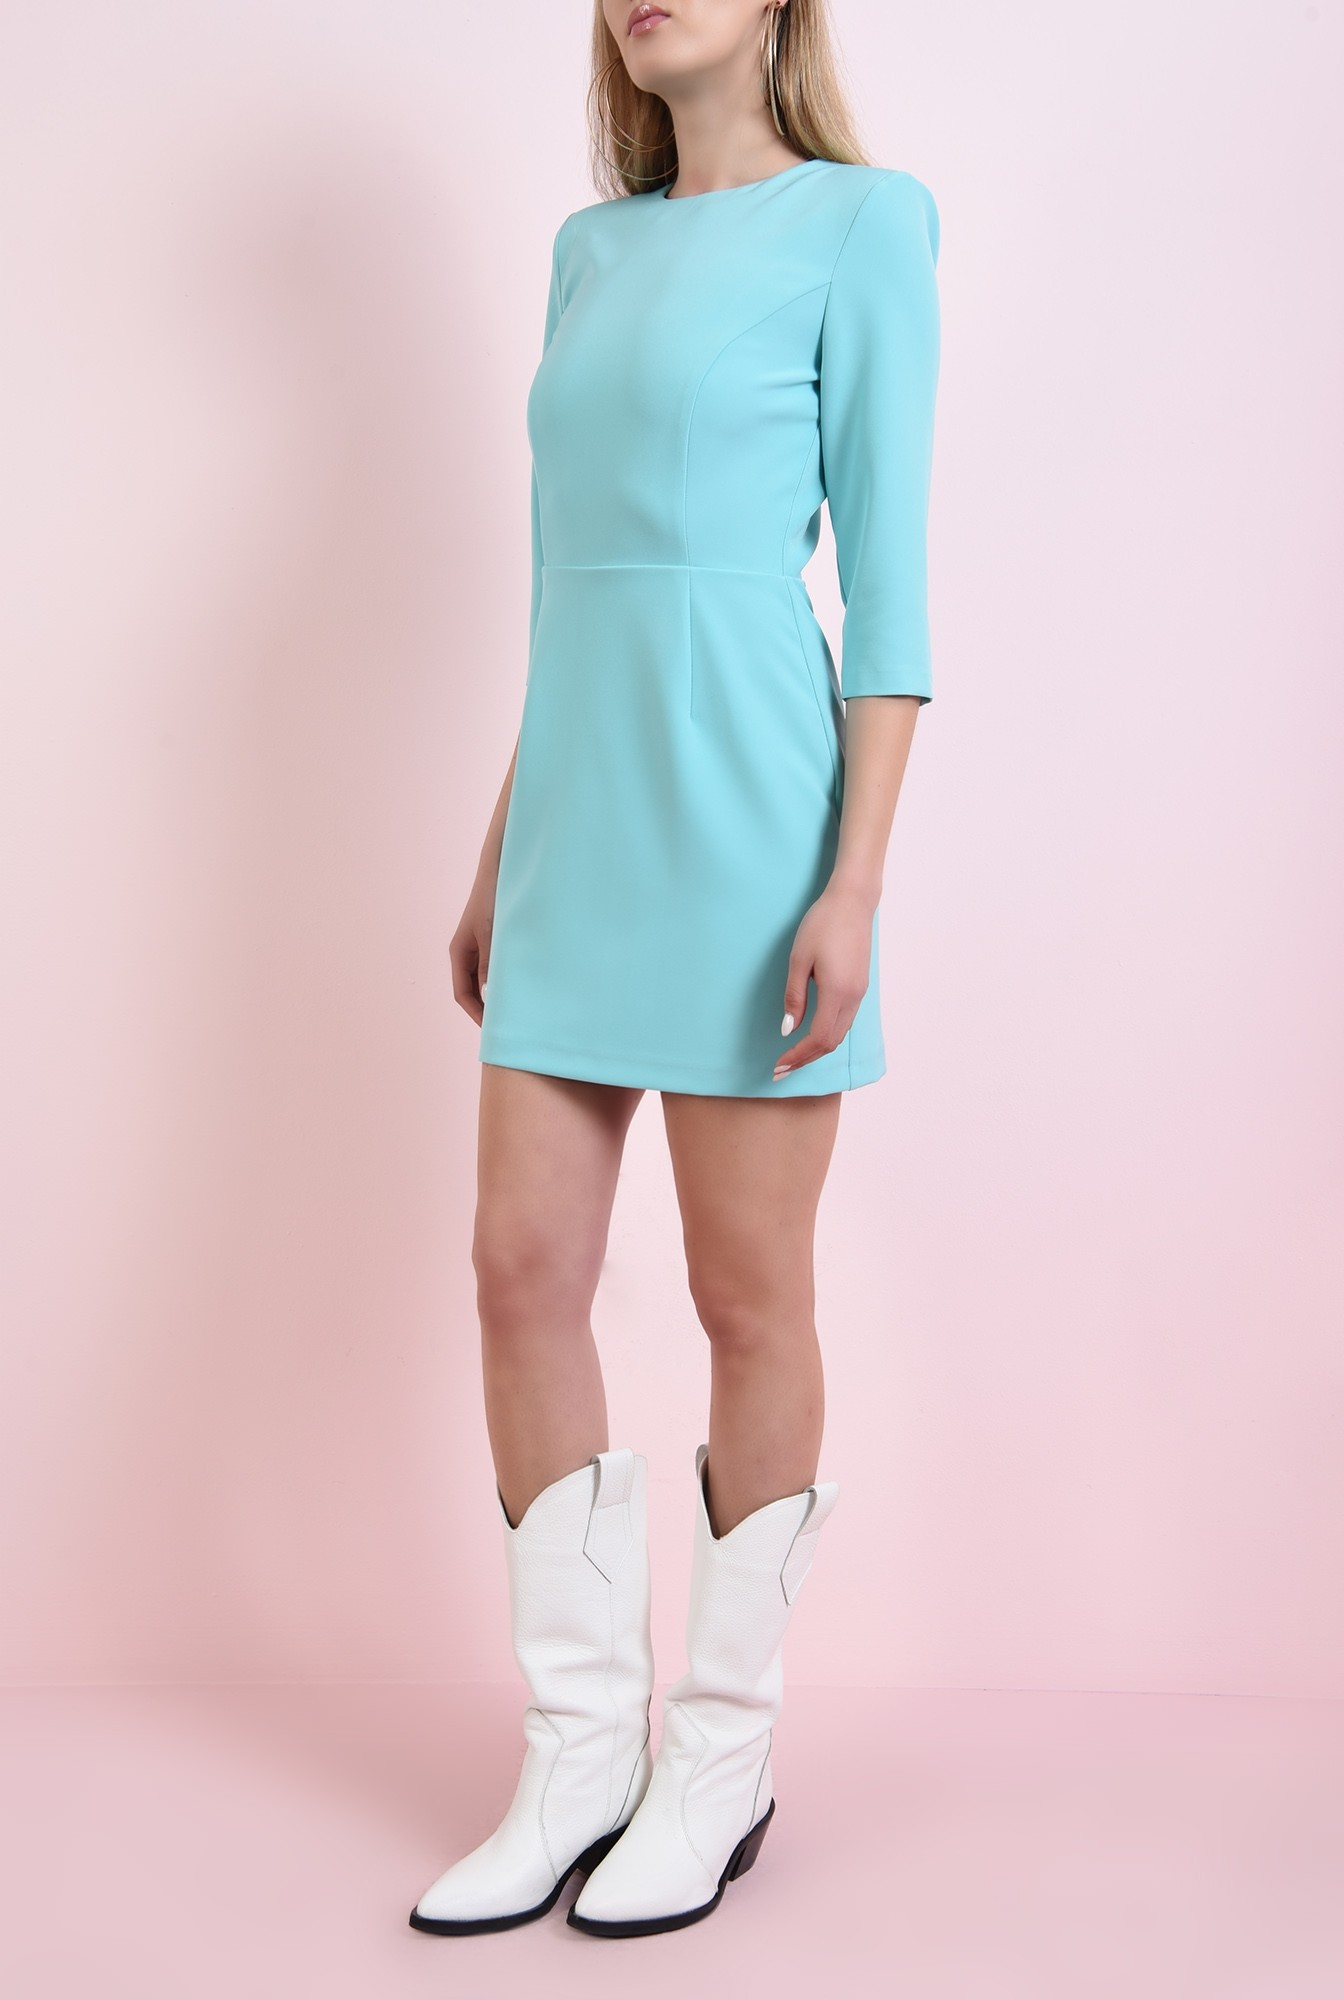 3 - 360 - rochie mini, turcoaz, cu decupaj